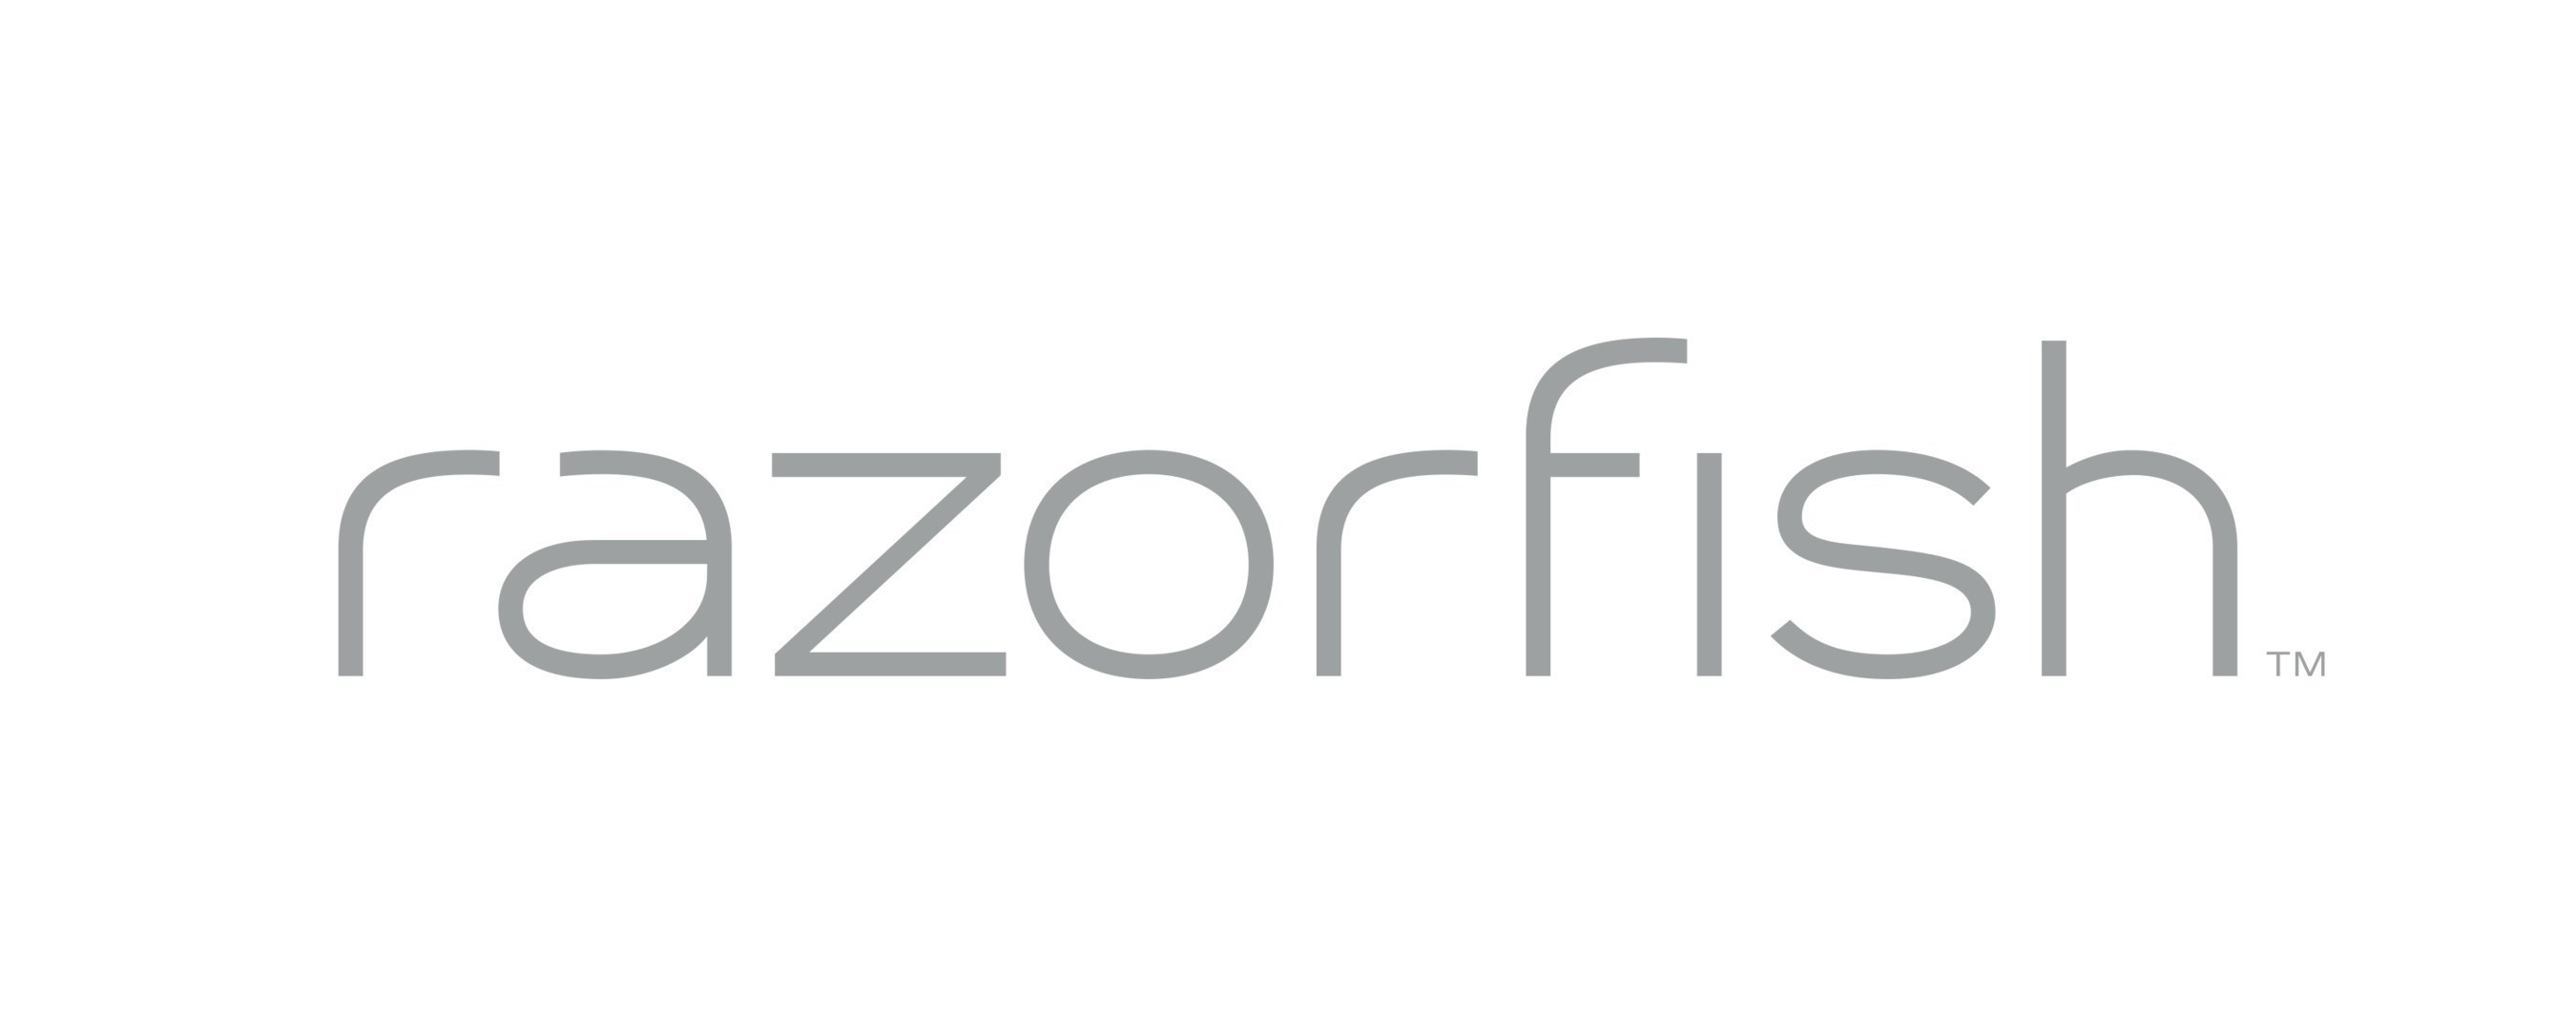 Razorfish Announces COSMOS Data Intelligence Platform